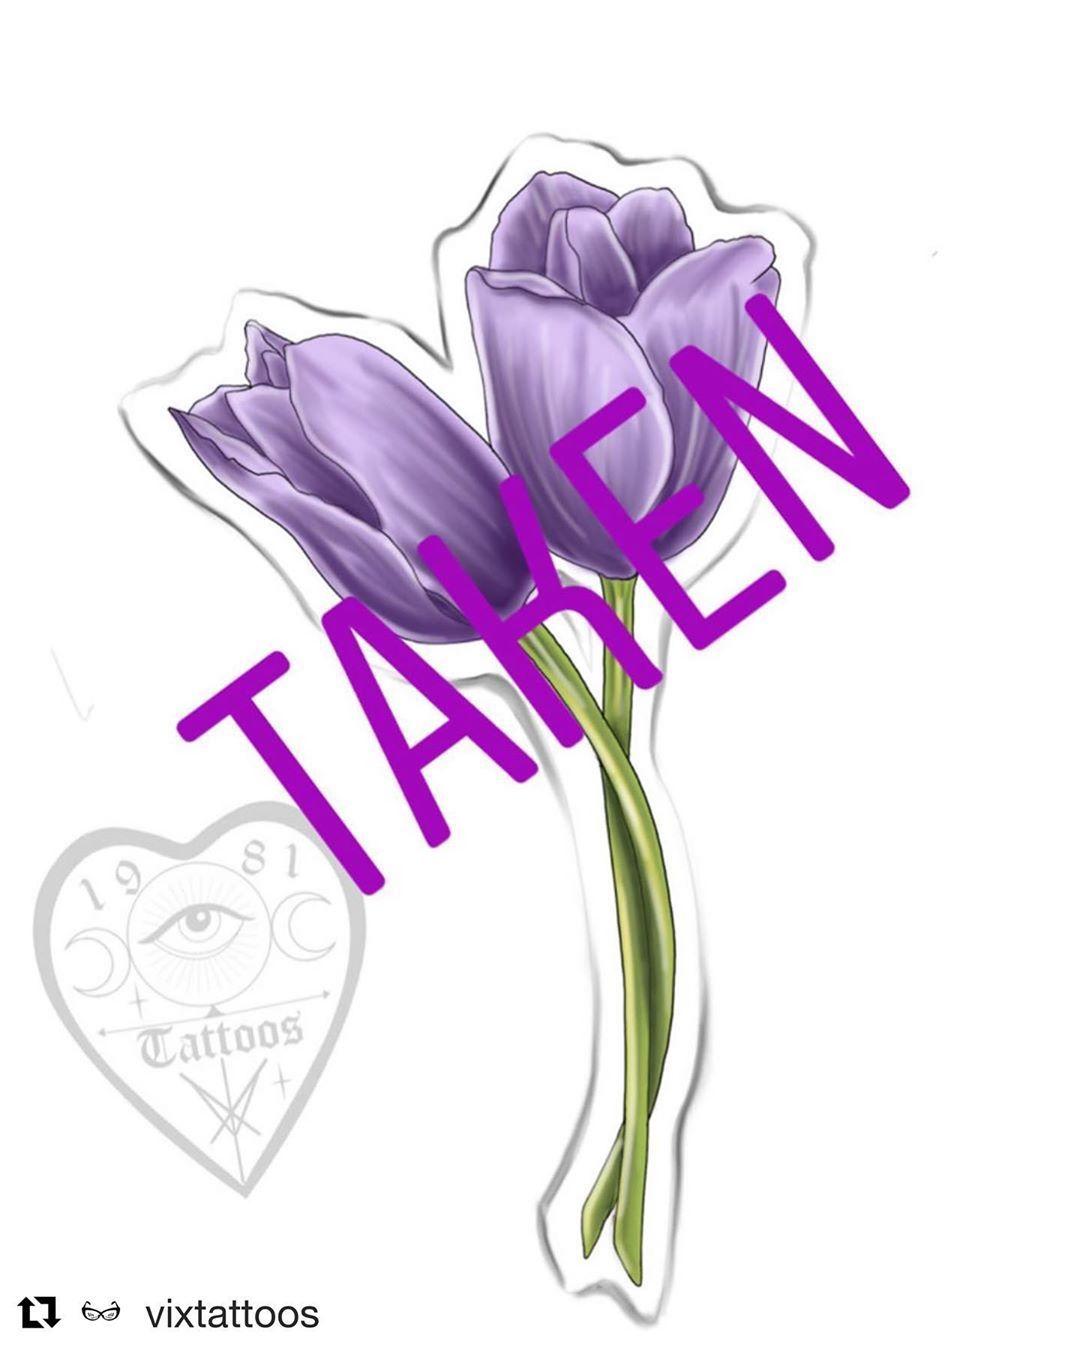 #Repost @vixtattoos with @get_repost ・・・ Another design taken...can't wait to get back to work 😩  #southeastlondontattoo #tattoo#tattoos #tattoodesigns #blackandgreytattoo #eternalink #newelthamtattoos #newelthamtattooist #vixtattoos #jesterstattoos #femaletattooartist #se9tattoos#greenwichtattoos#sidcuptattoos#londontattoos #newtattoo #newink#inked#tattoodesign#femaletattooist